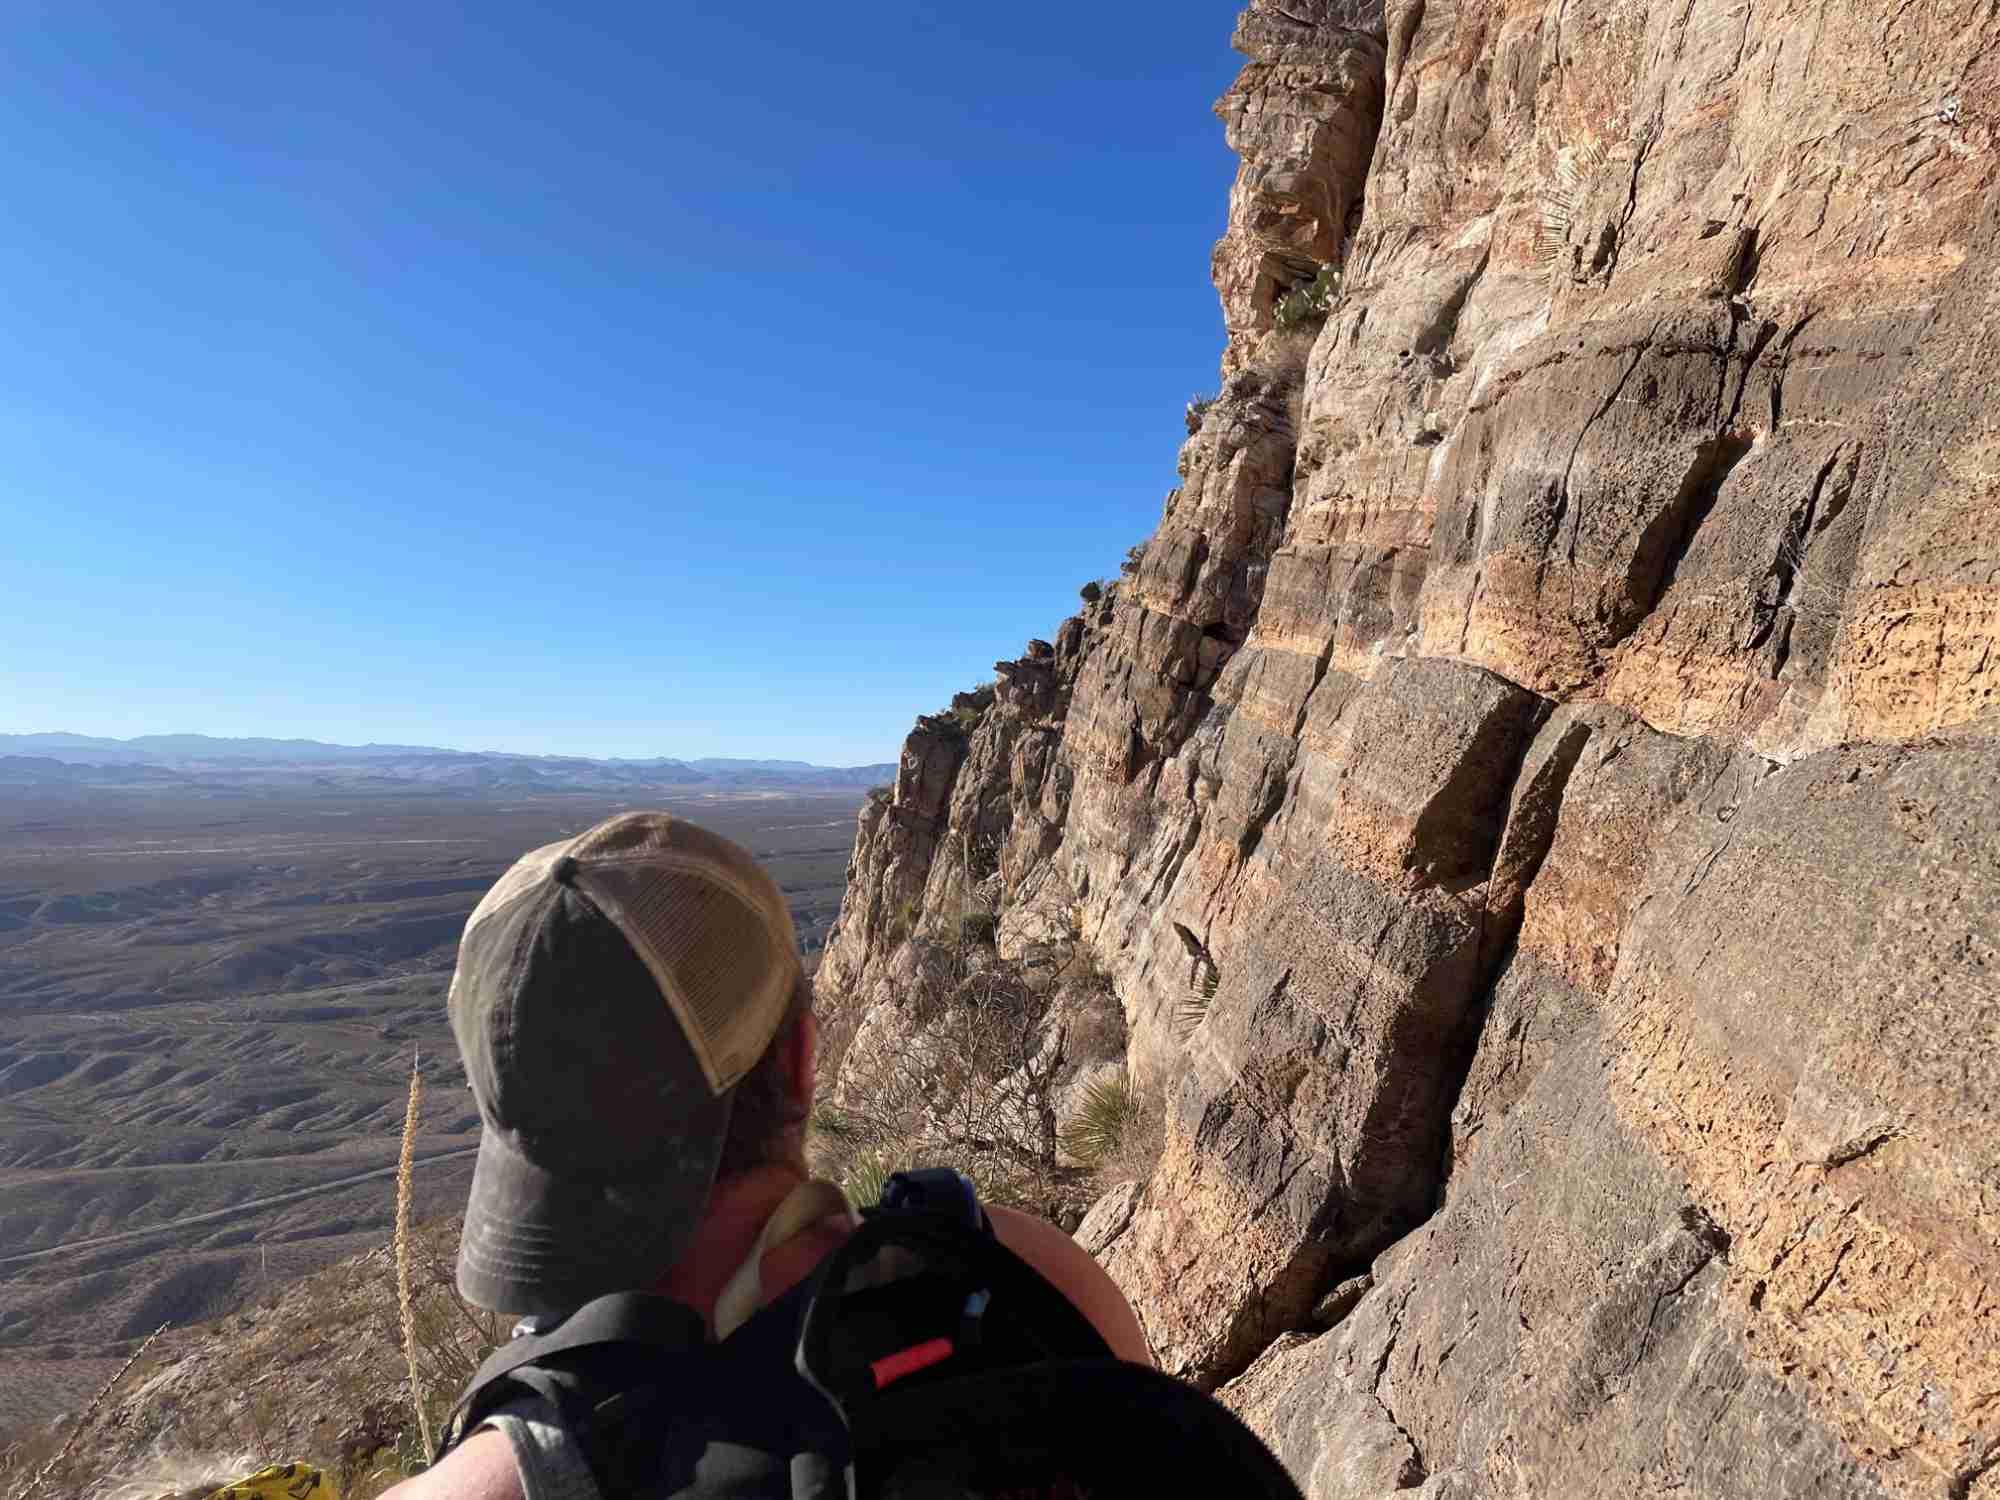 Viewing the Vacation Wall at Mud Mountain